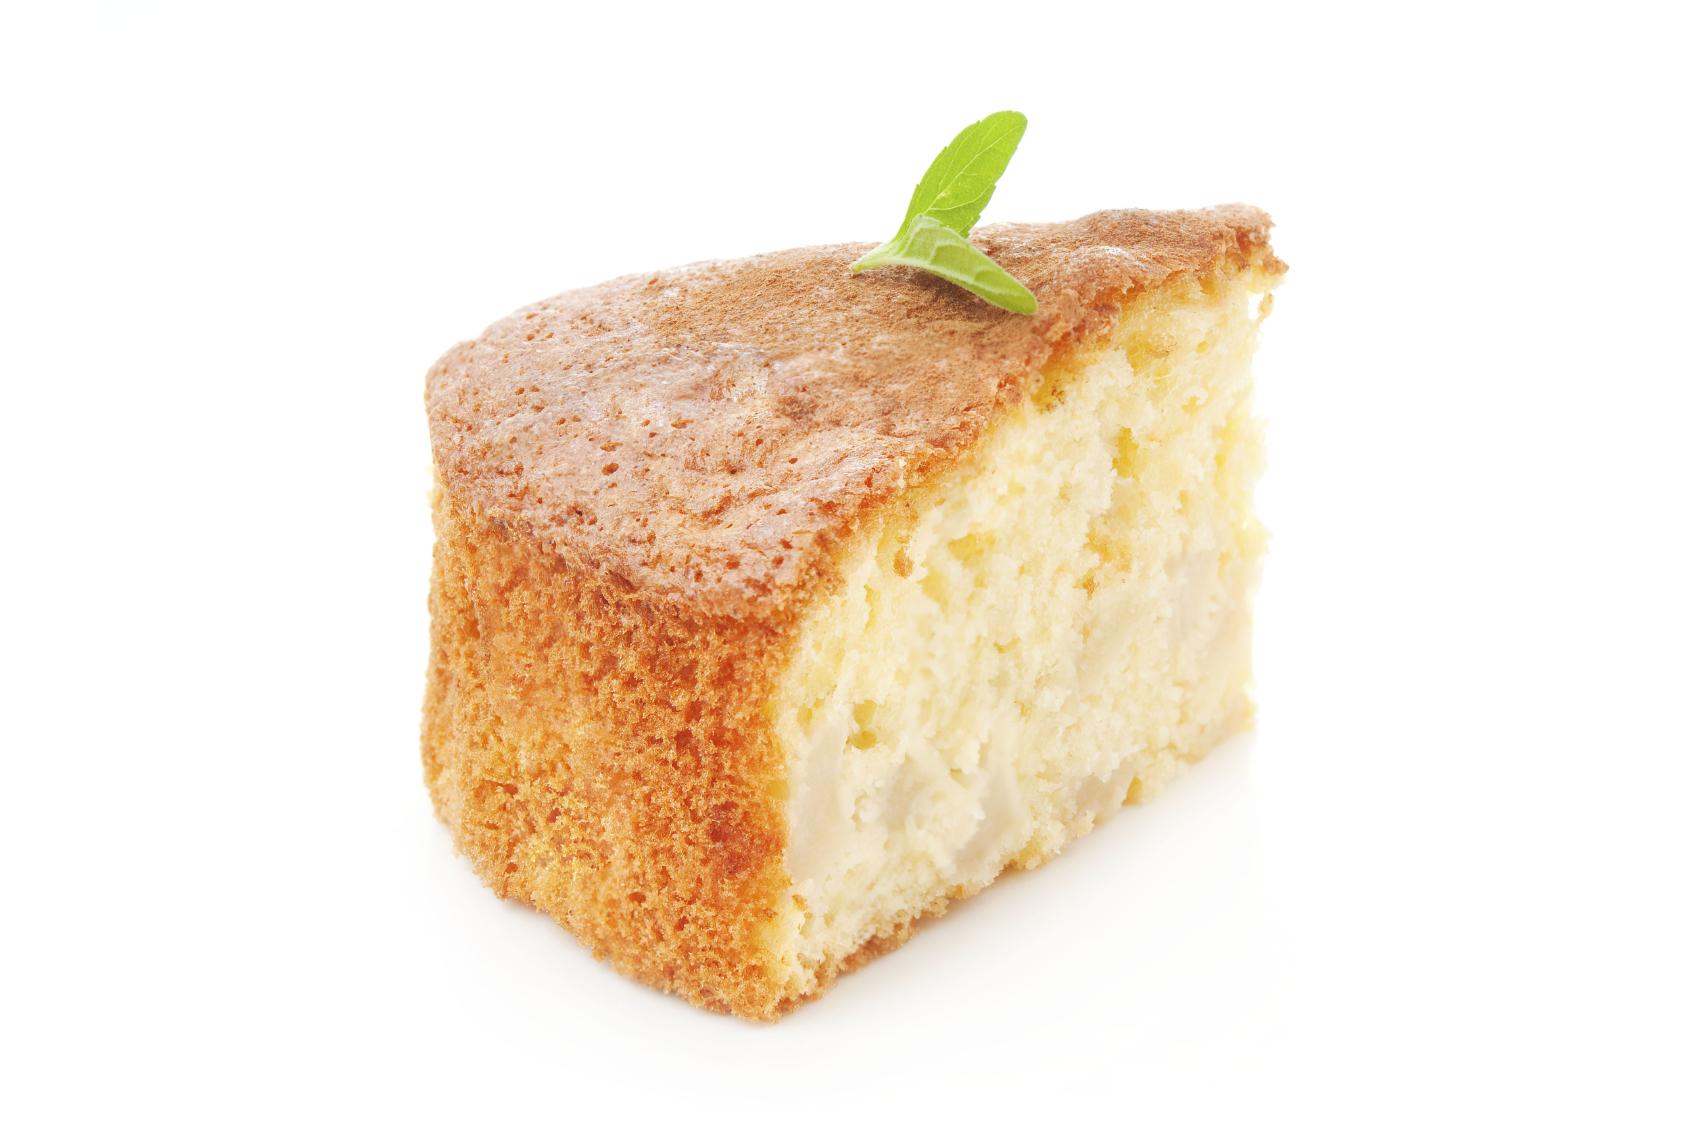 Dairy free orange cake